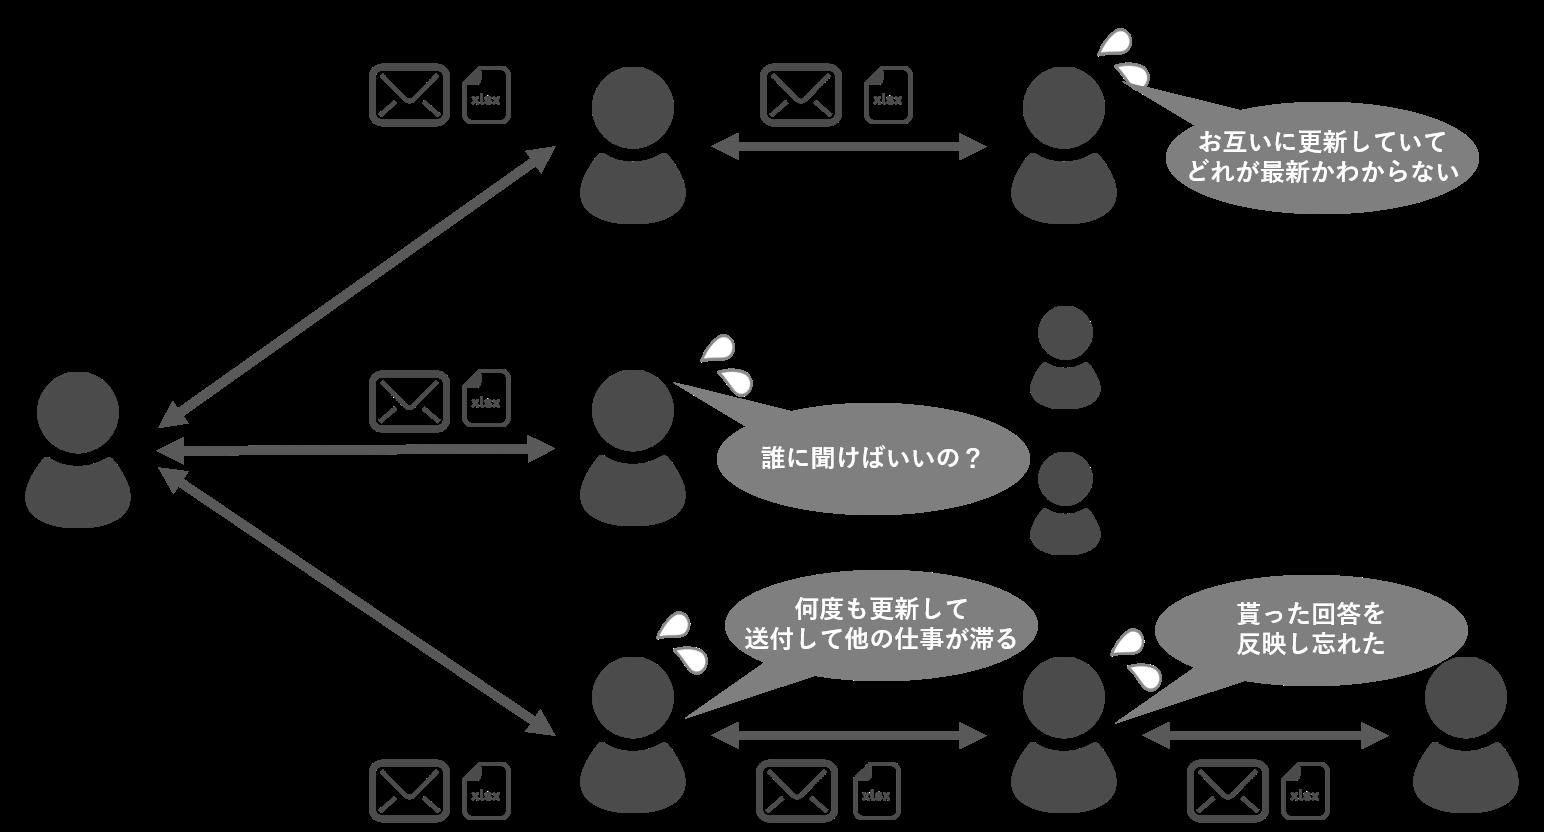 ap_communication-issue